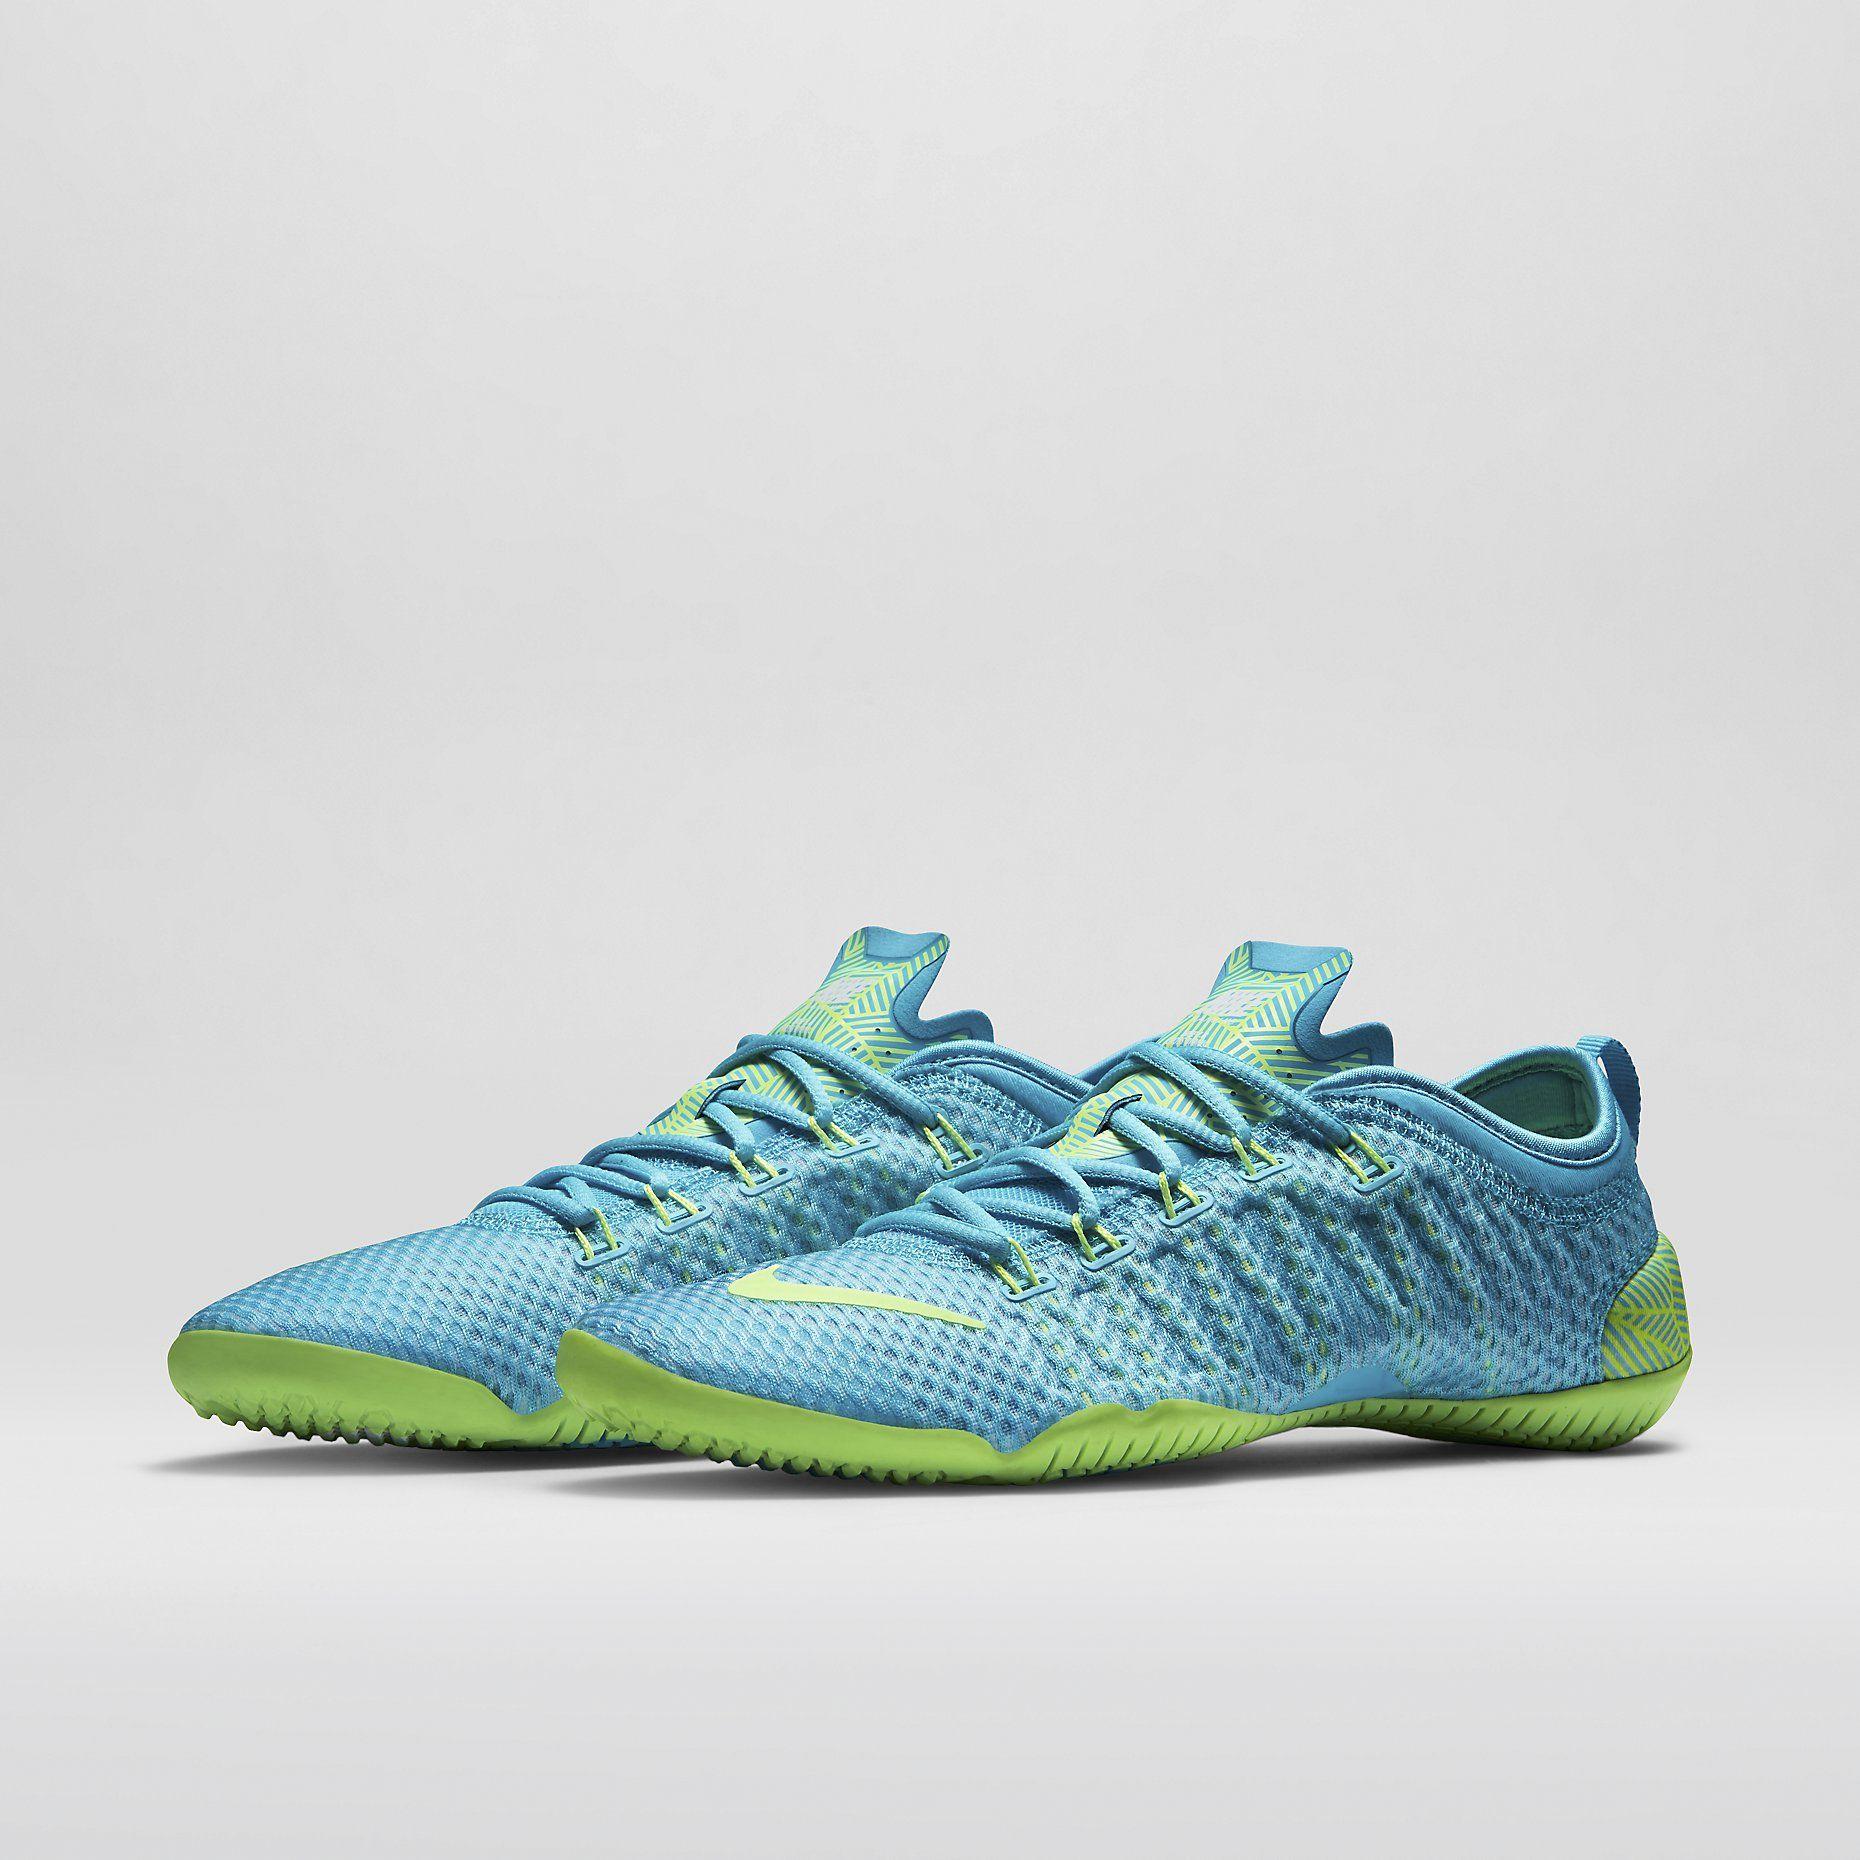 6415cee5ac0 Nike Free 1.0 Cross Bionic – Chaussure de training pour Femme. Nike Store FR